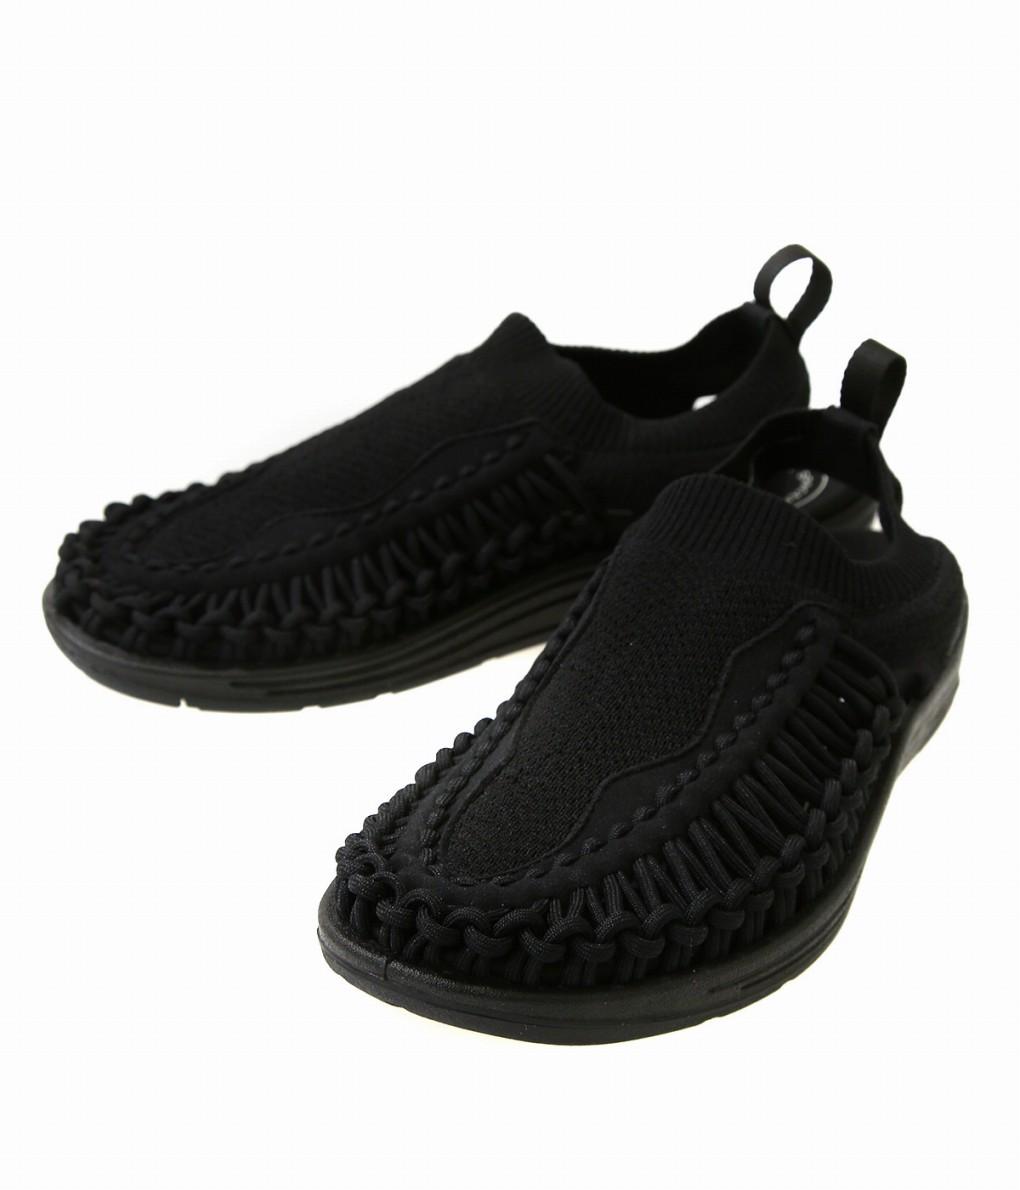 KEEN / キーン : UNEEK EVO : ユニークエヴォ サンダル 靴 メンズ : 1021484【STD】【REA】